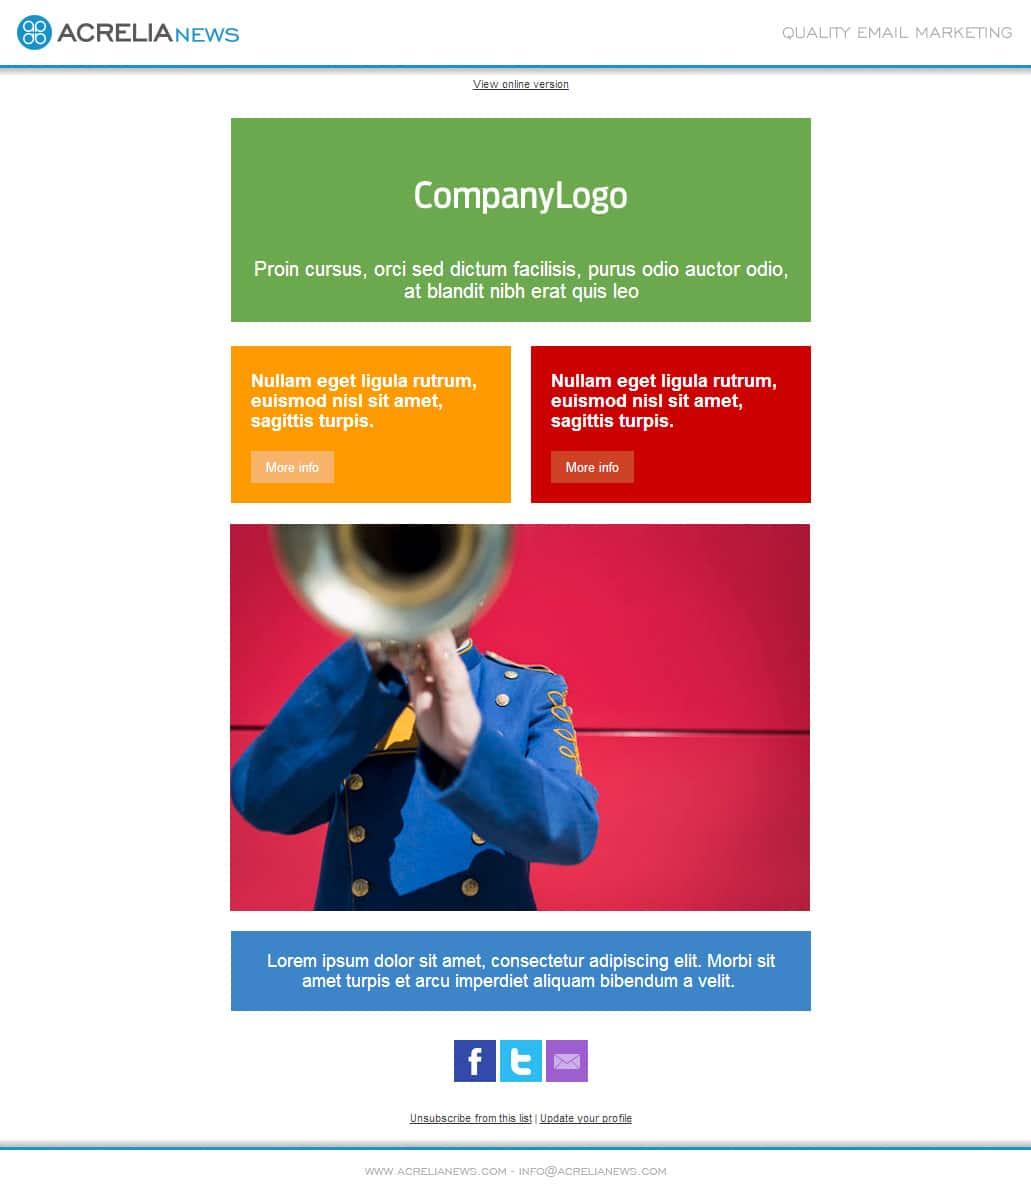 Plantilla de email responsive: Colors